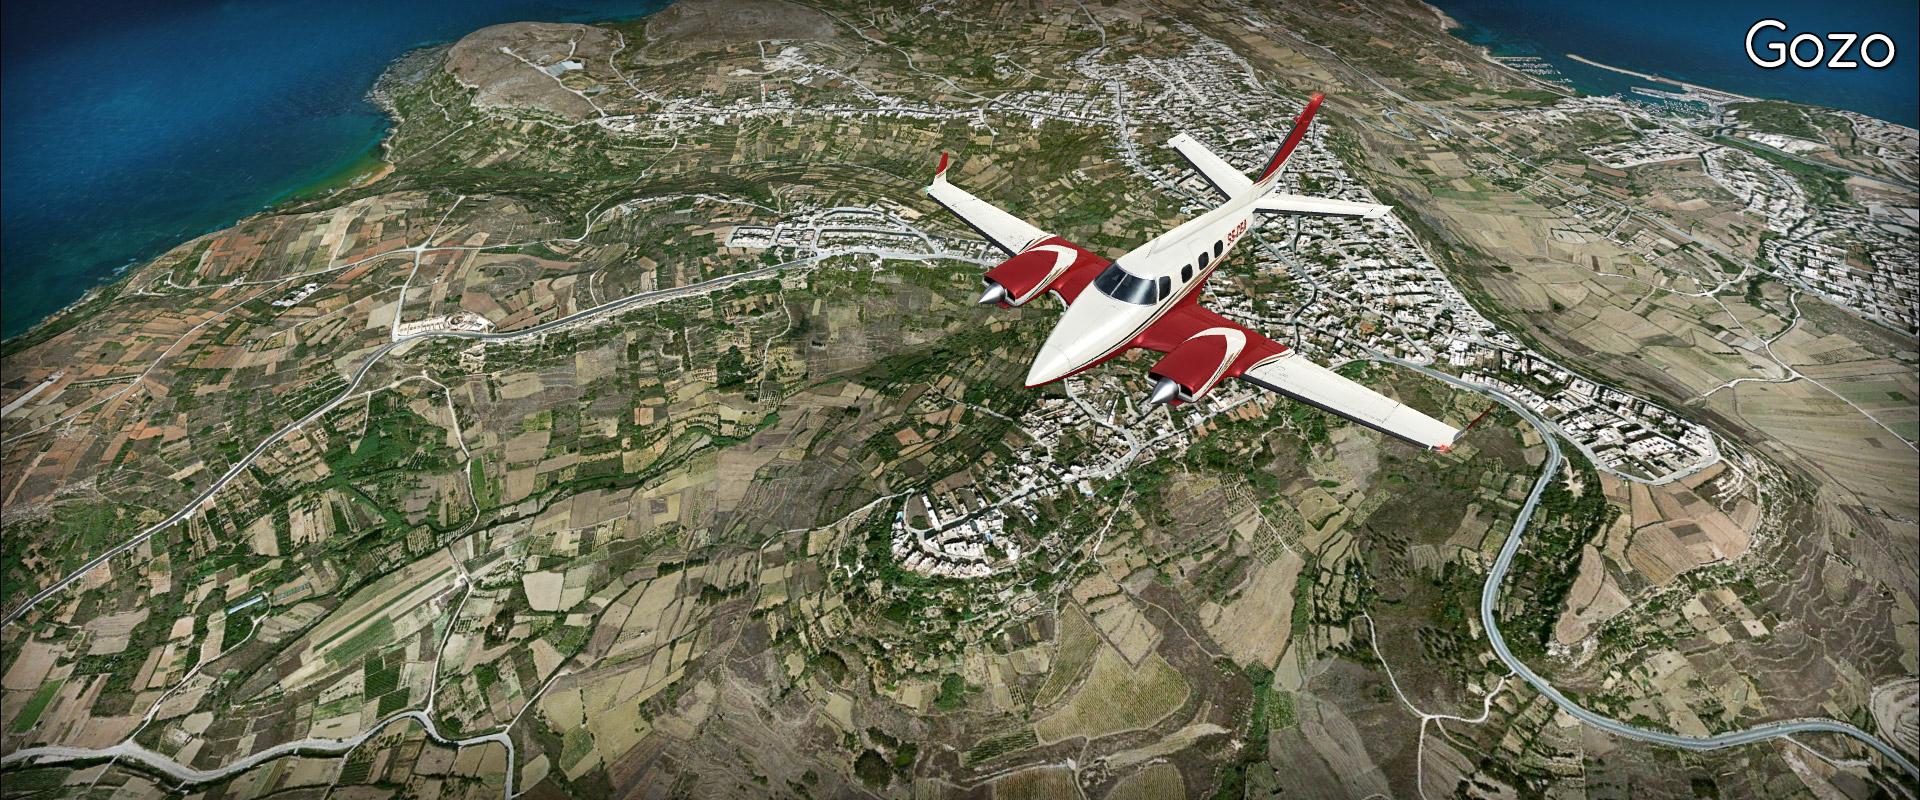 Malta - Palermo, Sicily (LMML-LICJ) • C-Aviation